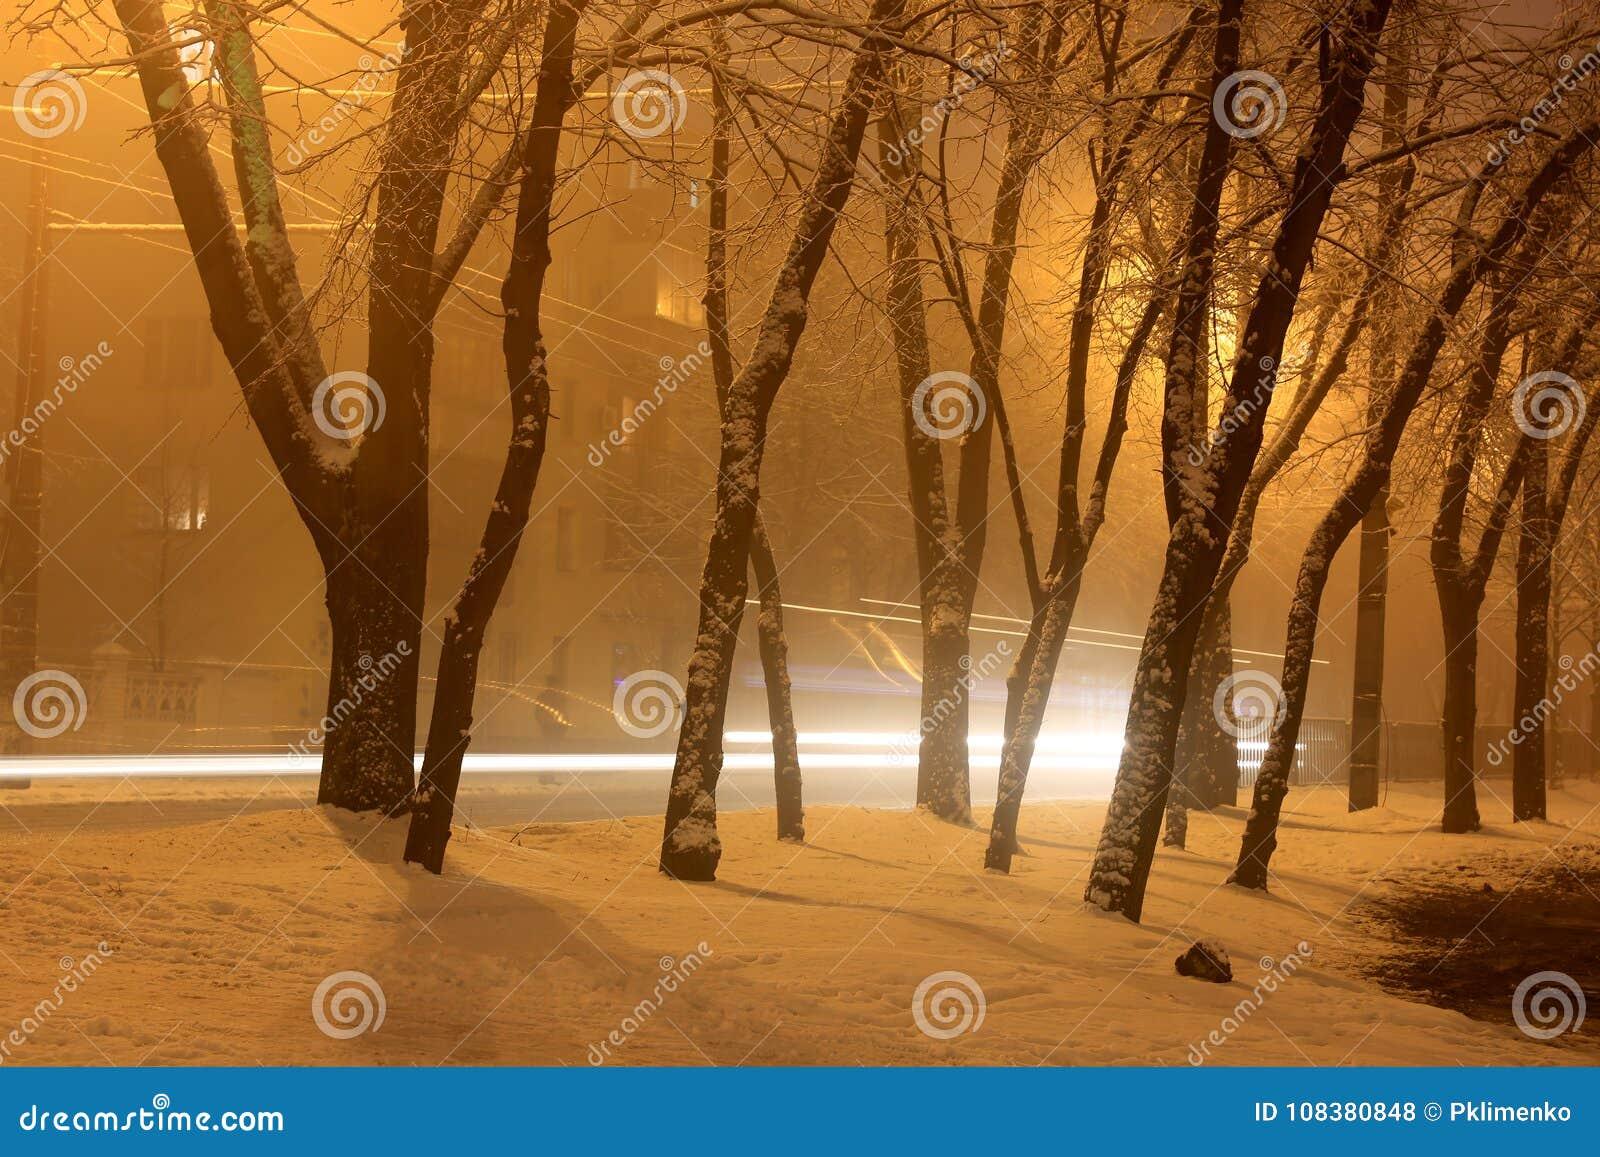 Night winter park